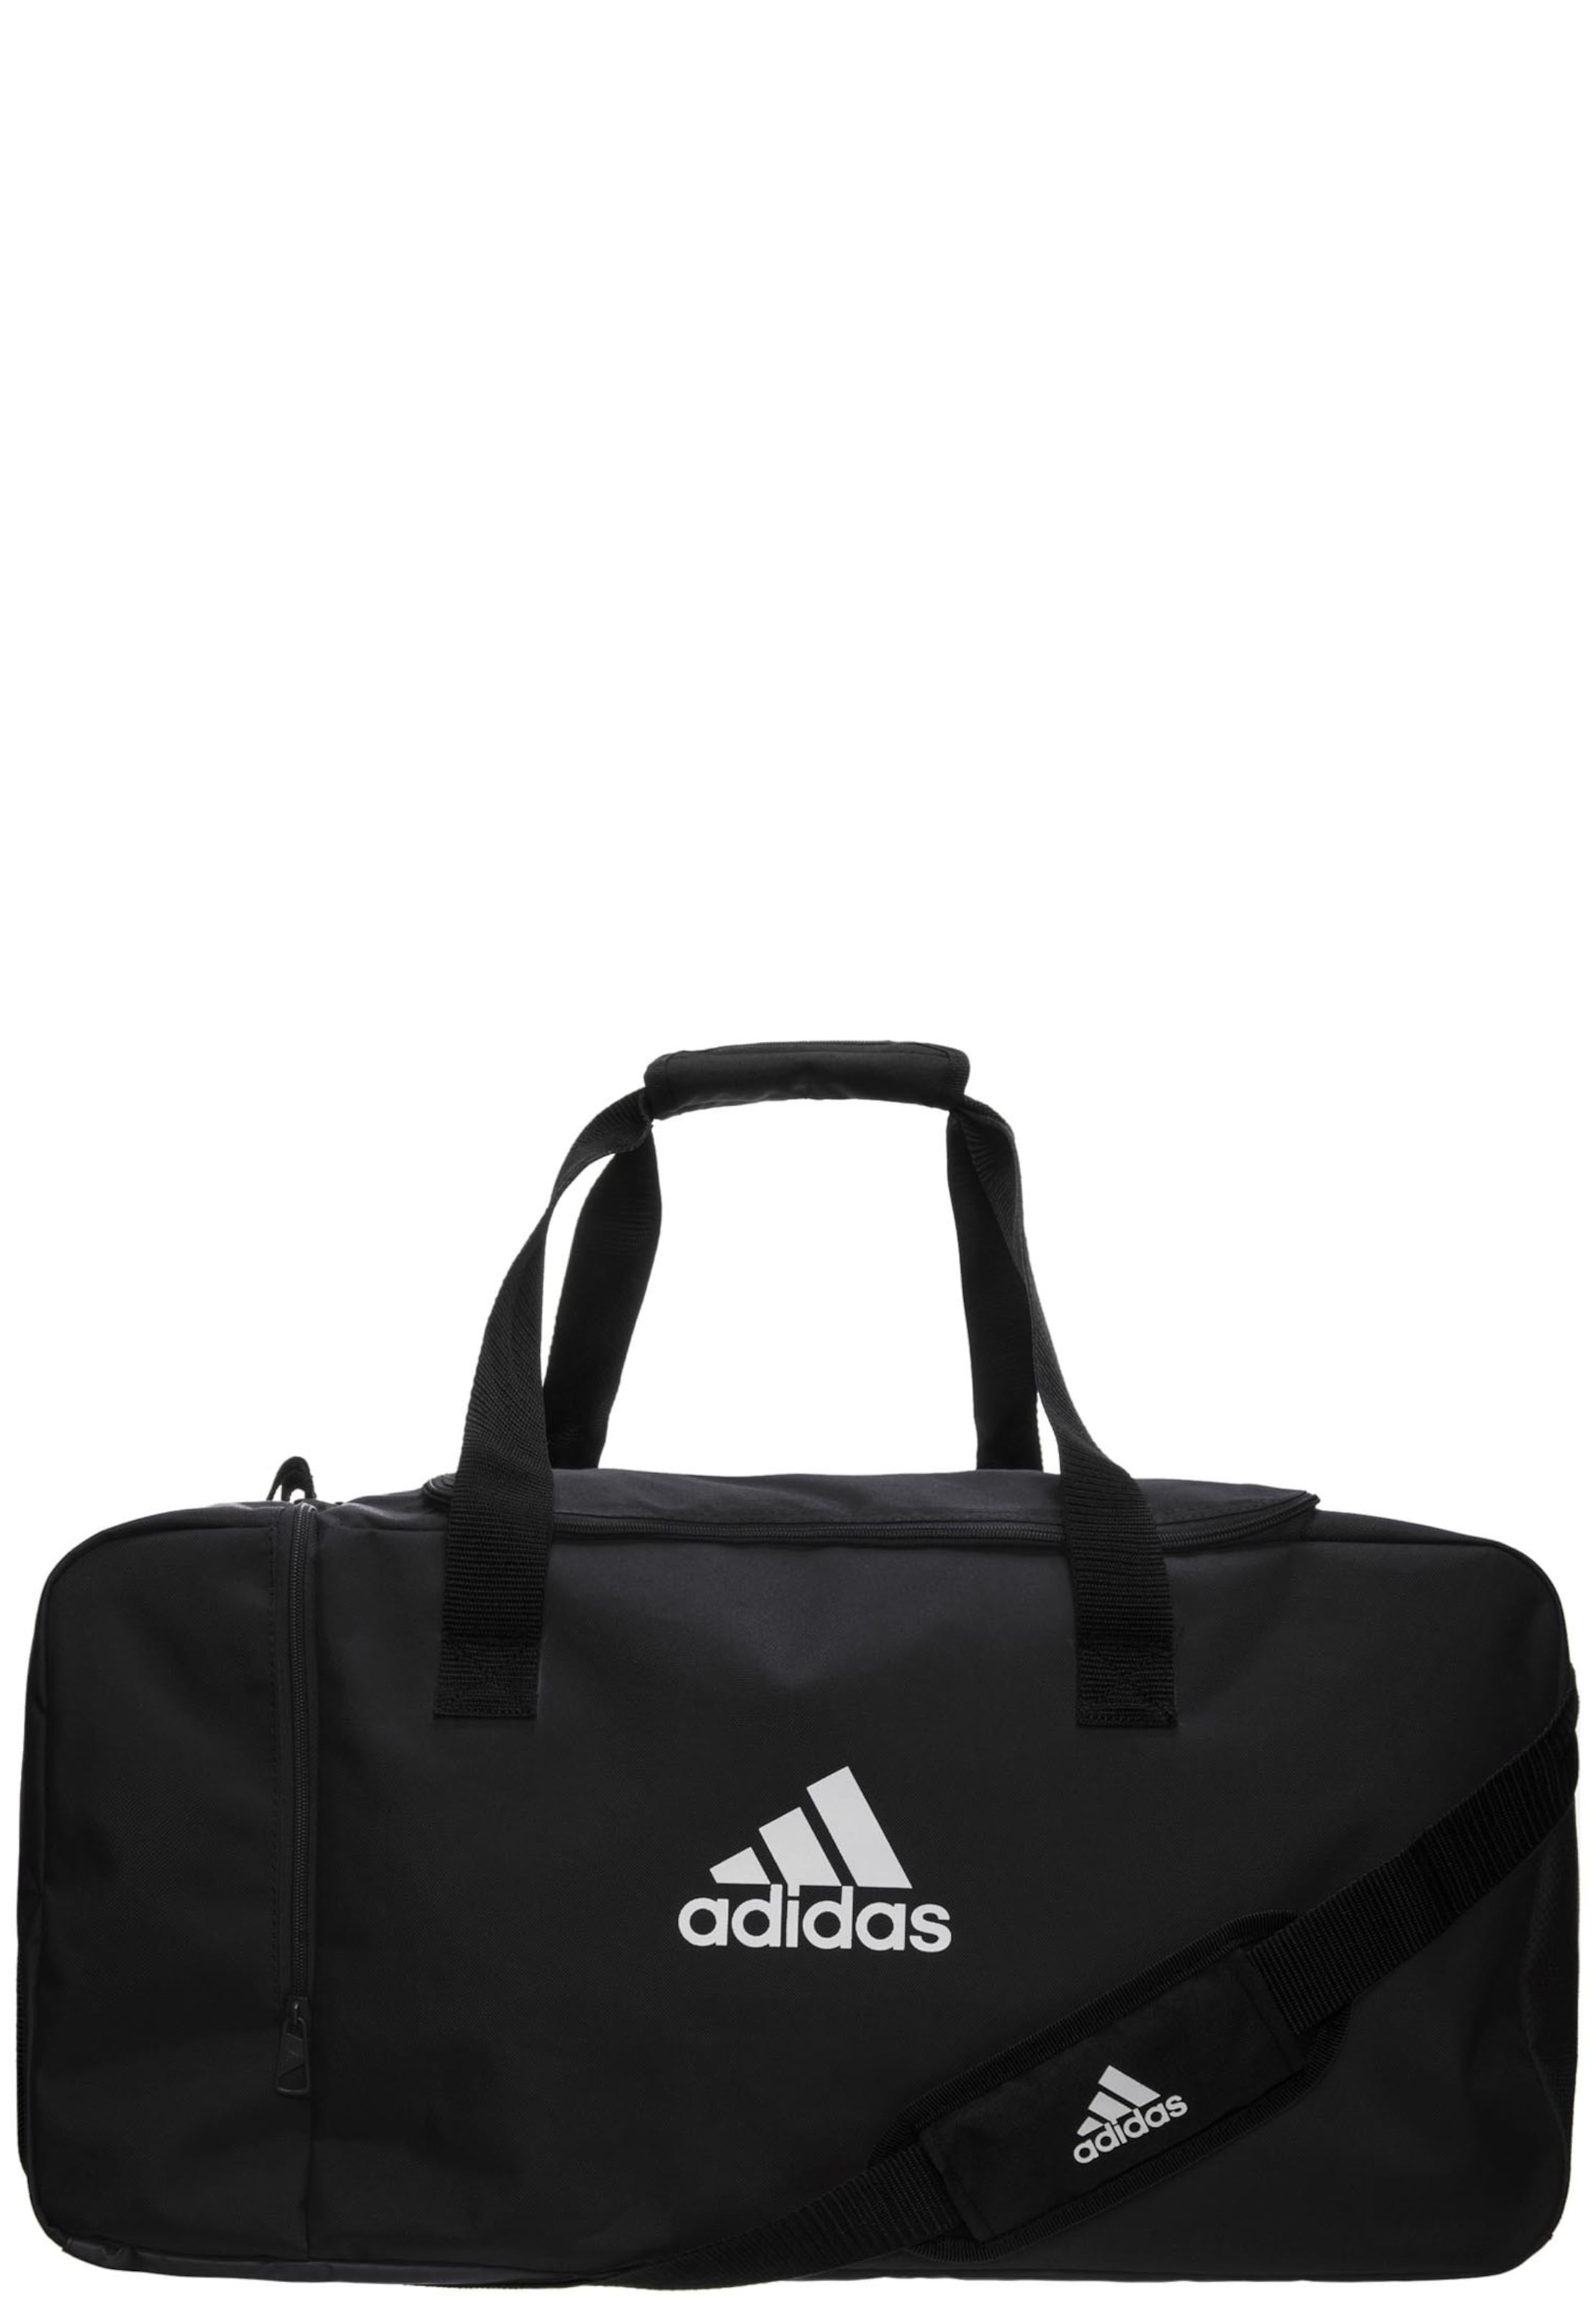 Blanc Sport Sac 'tiro' BleuNoir De En Adidas Performance qSpMVUz